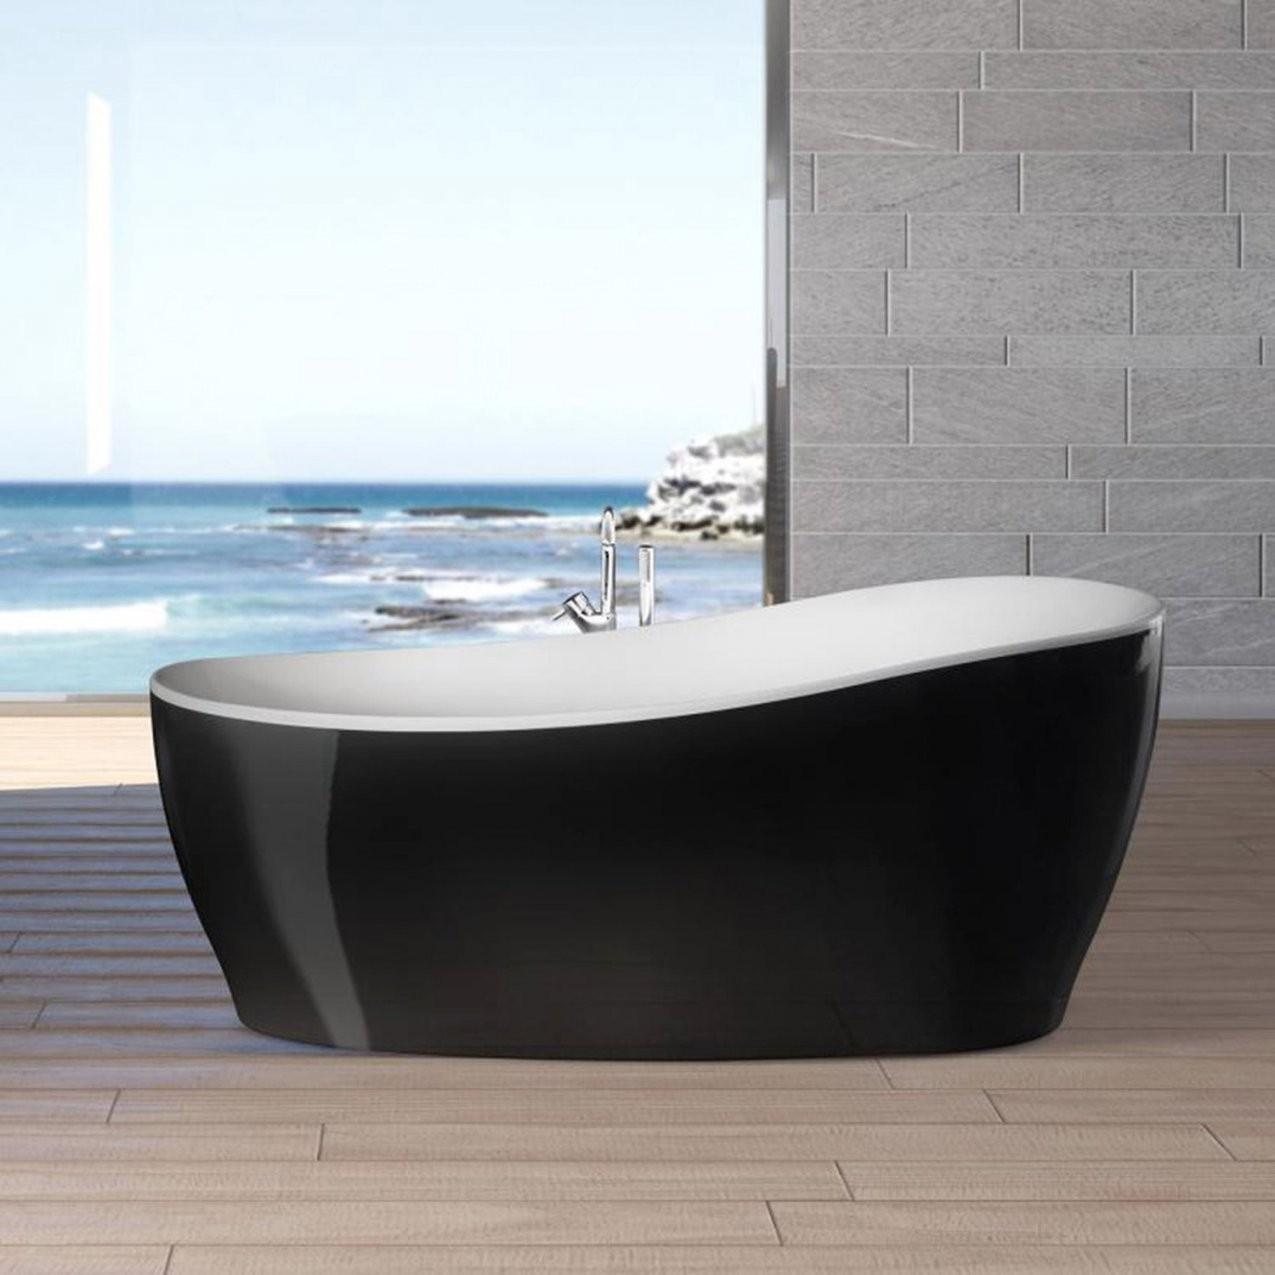 Freistehende Badewanne Aviva 180 Cm X 85 Cm Schwarzweiß Kaufen Bei Obi von Freistehende Badewanne Schwarz Photo